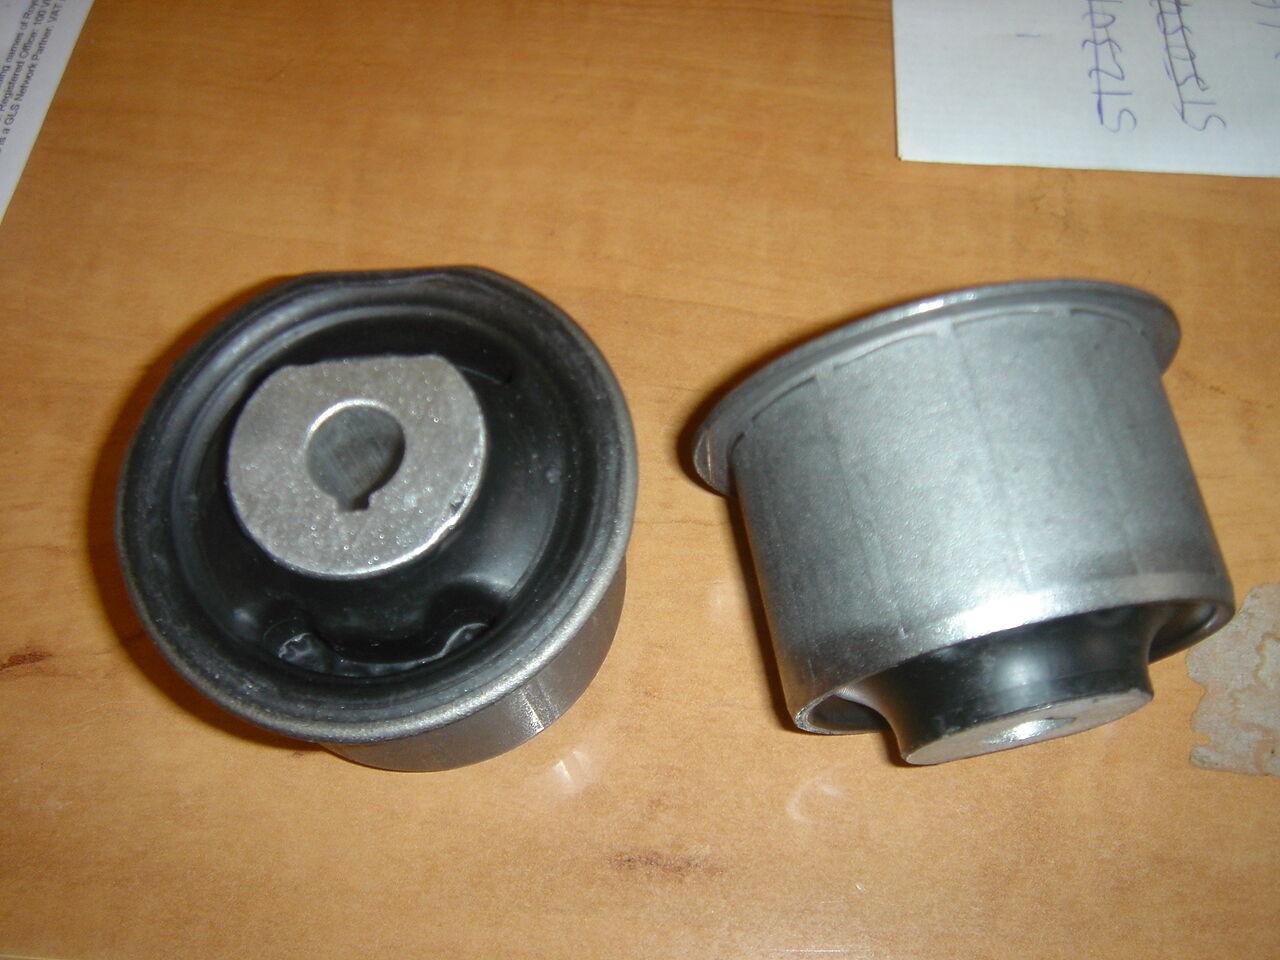 JEEP GRAND CHEROKEE 2005-08 FRONT AXLE MOUNTS ISOLATOR BUSH 52089516AB